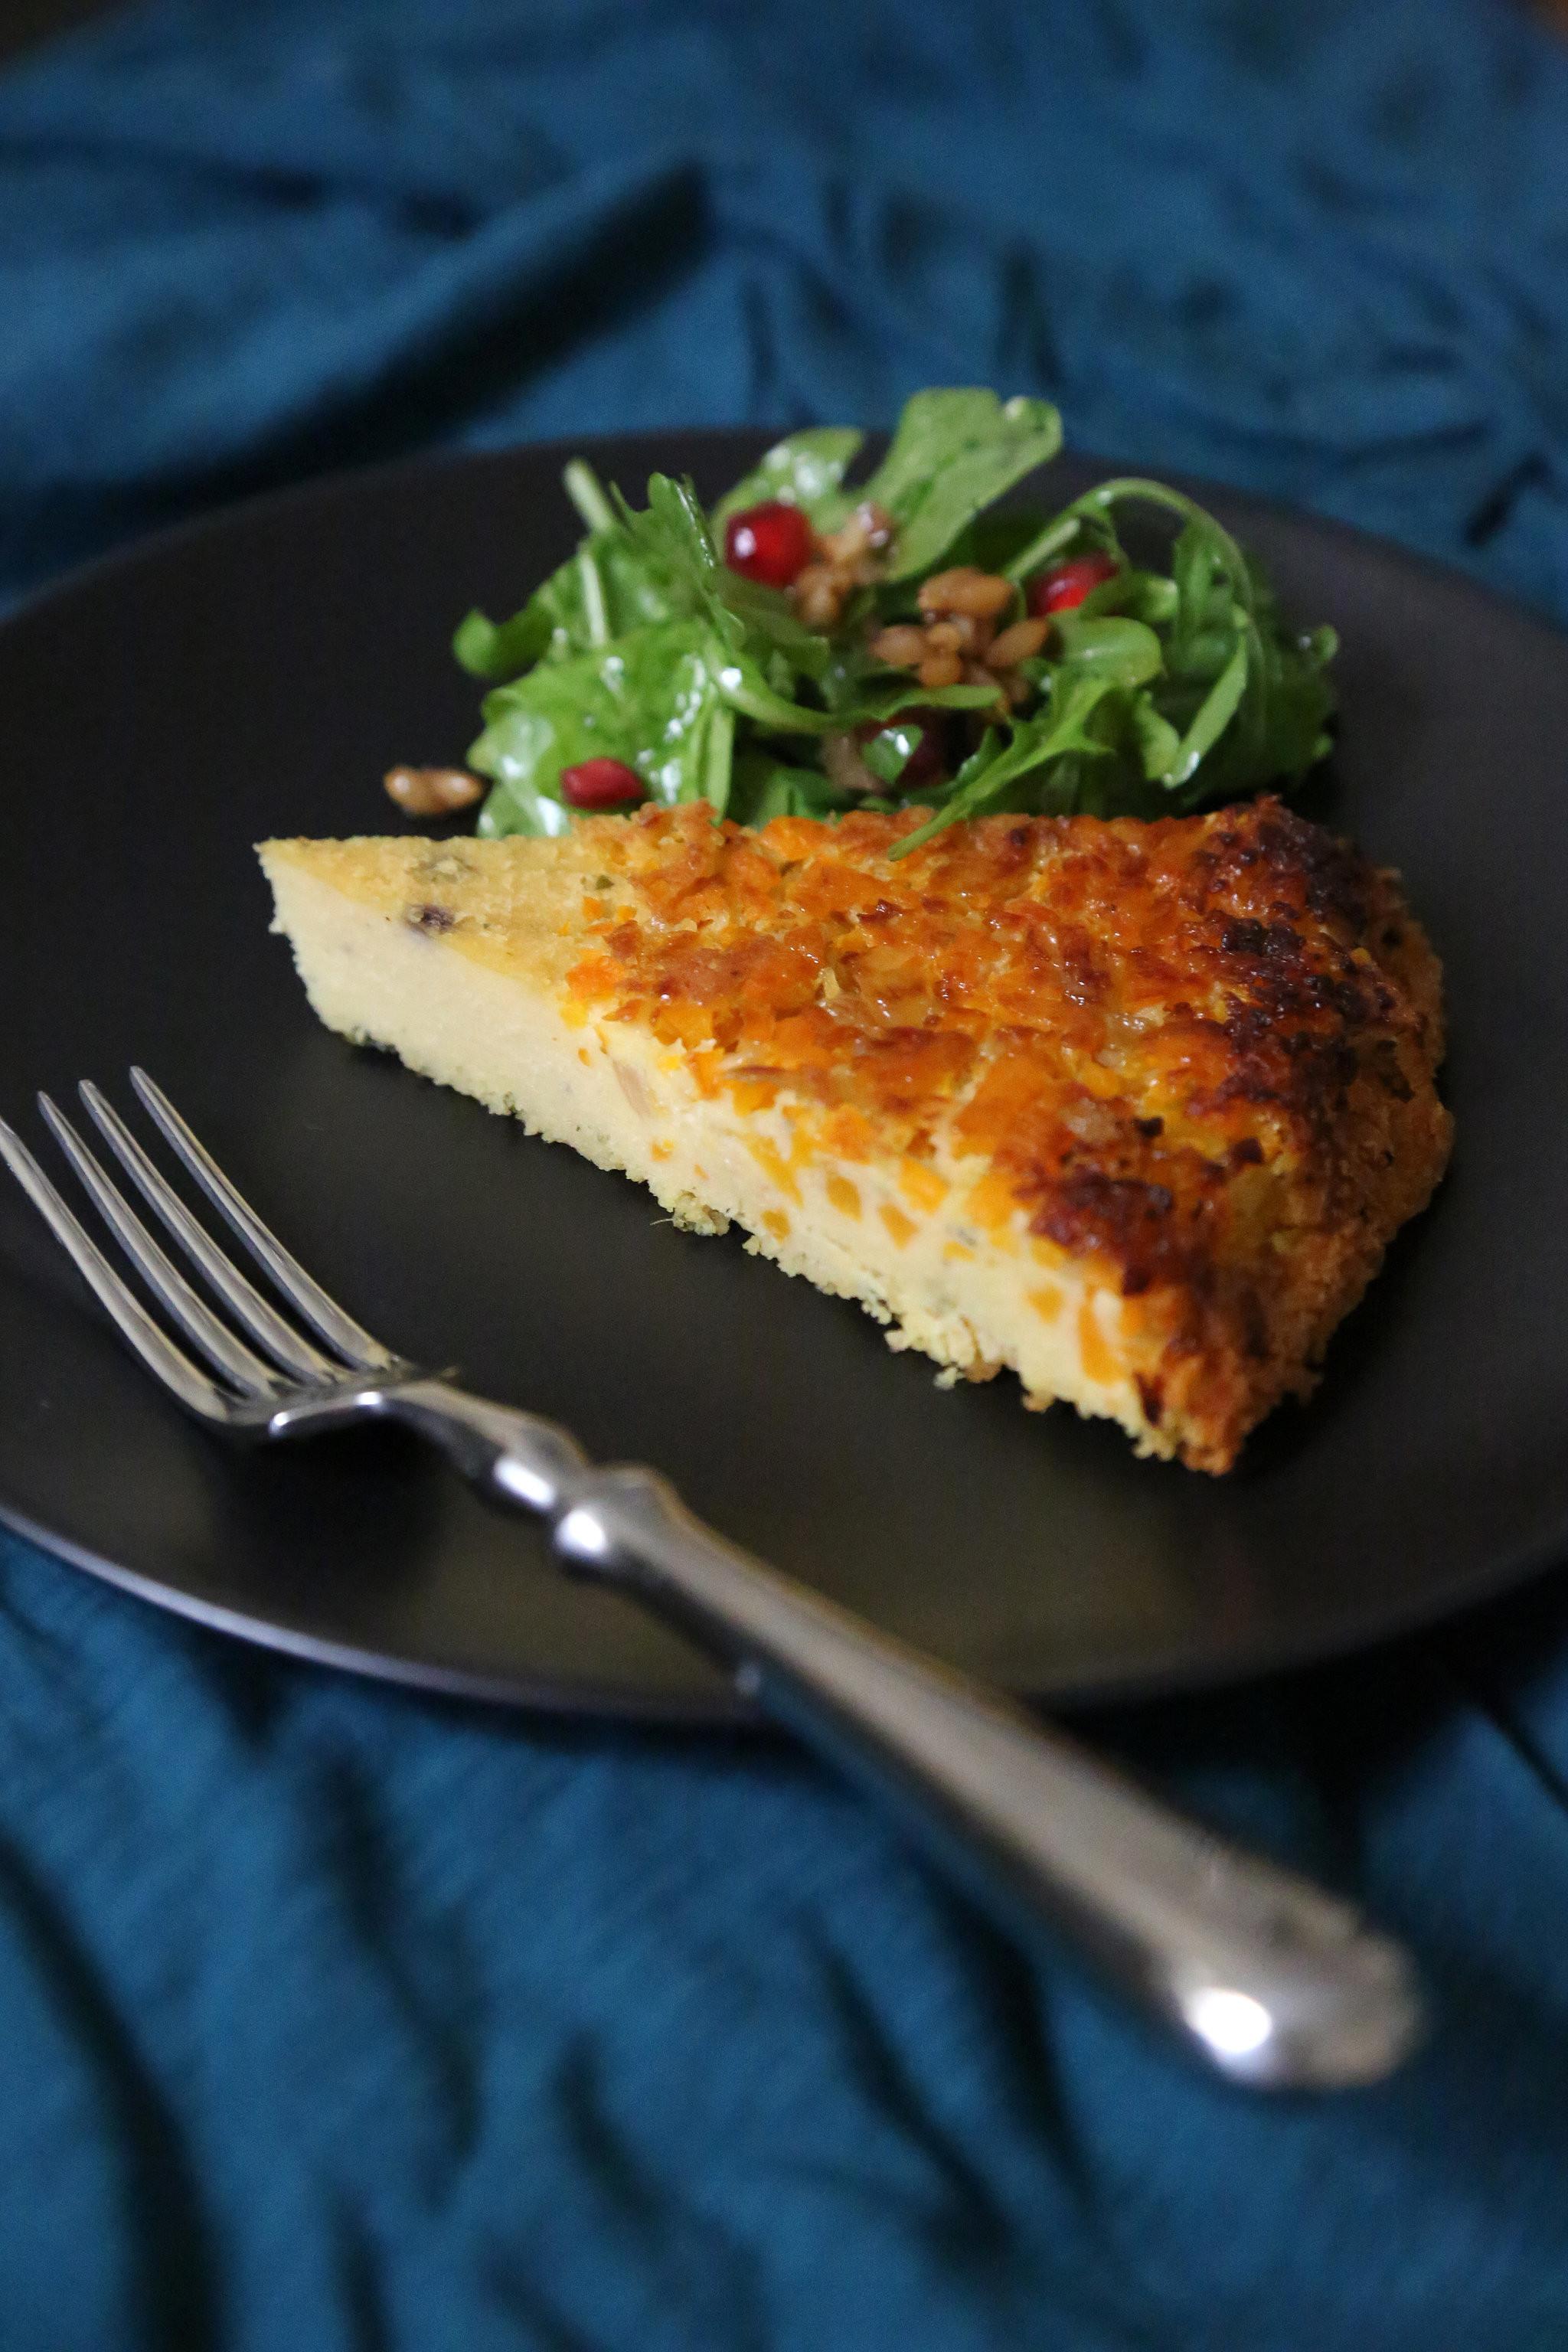 Vegetarian Thanksgiving Recipes Main Dish  Delicious Ve arian Thanksgiving Main Dish